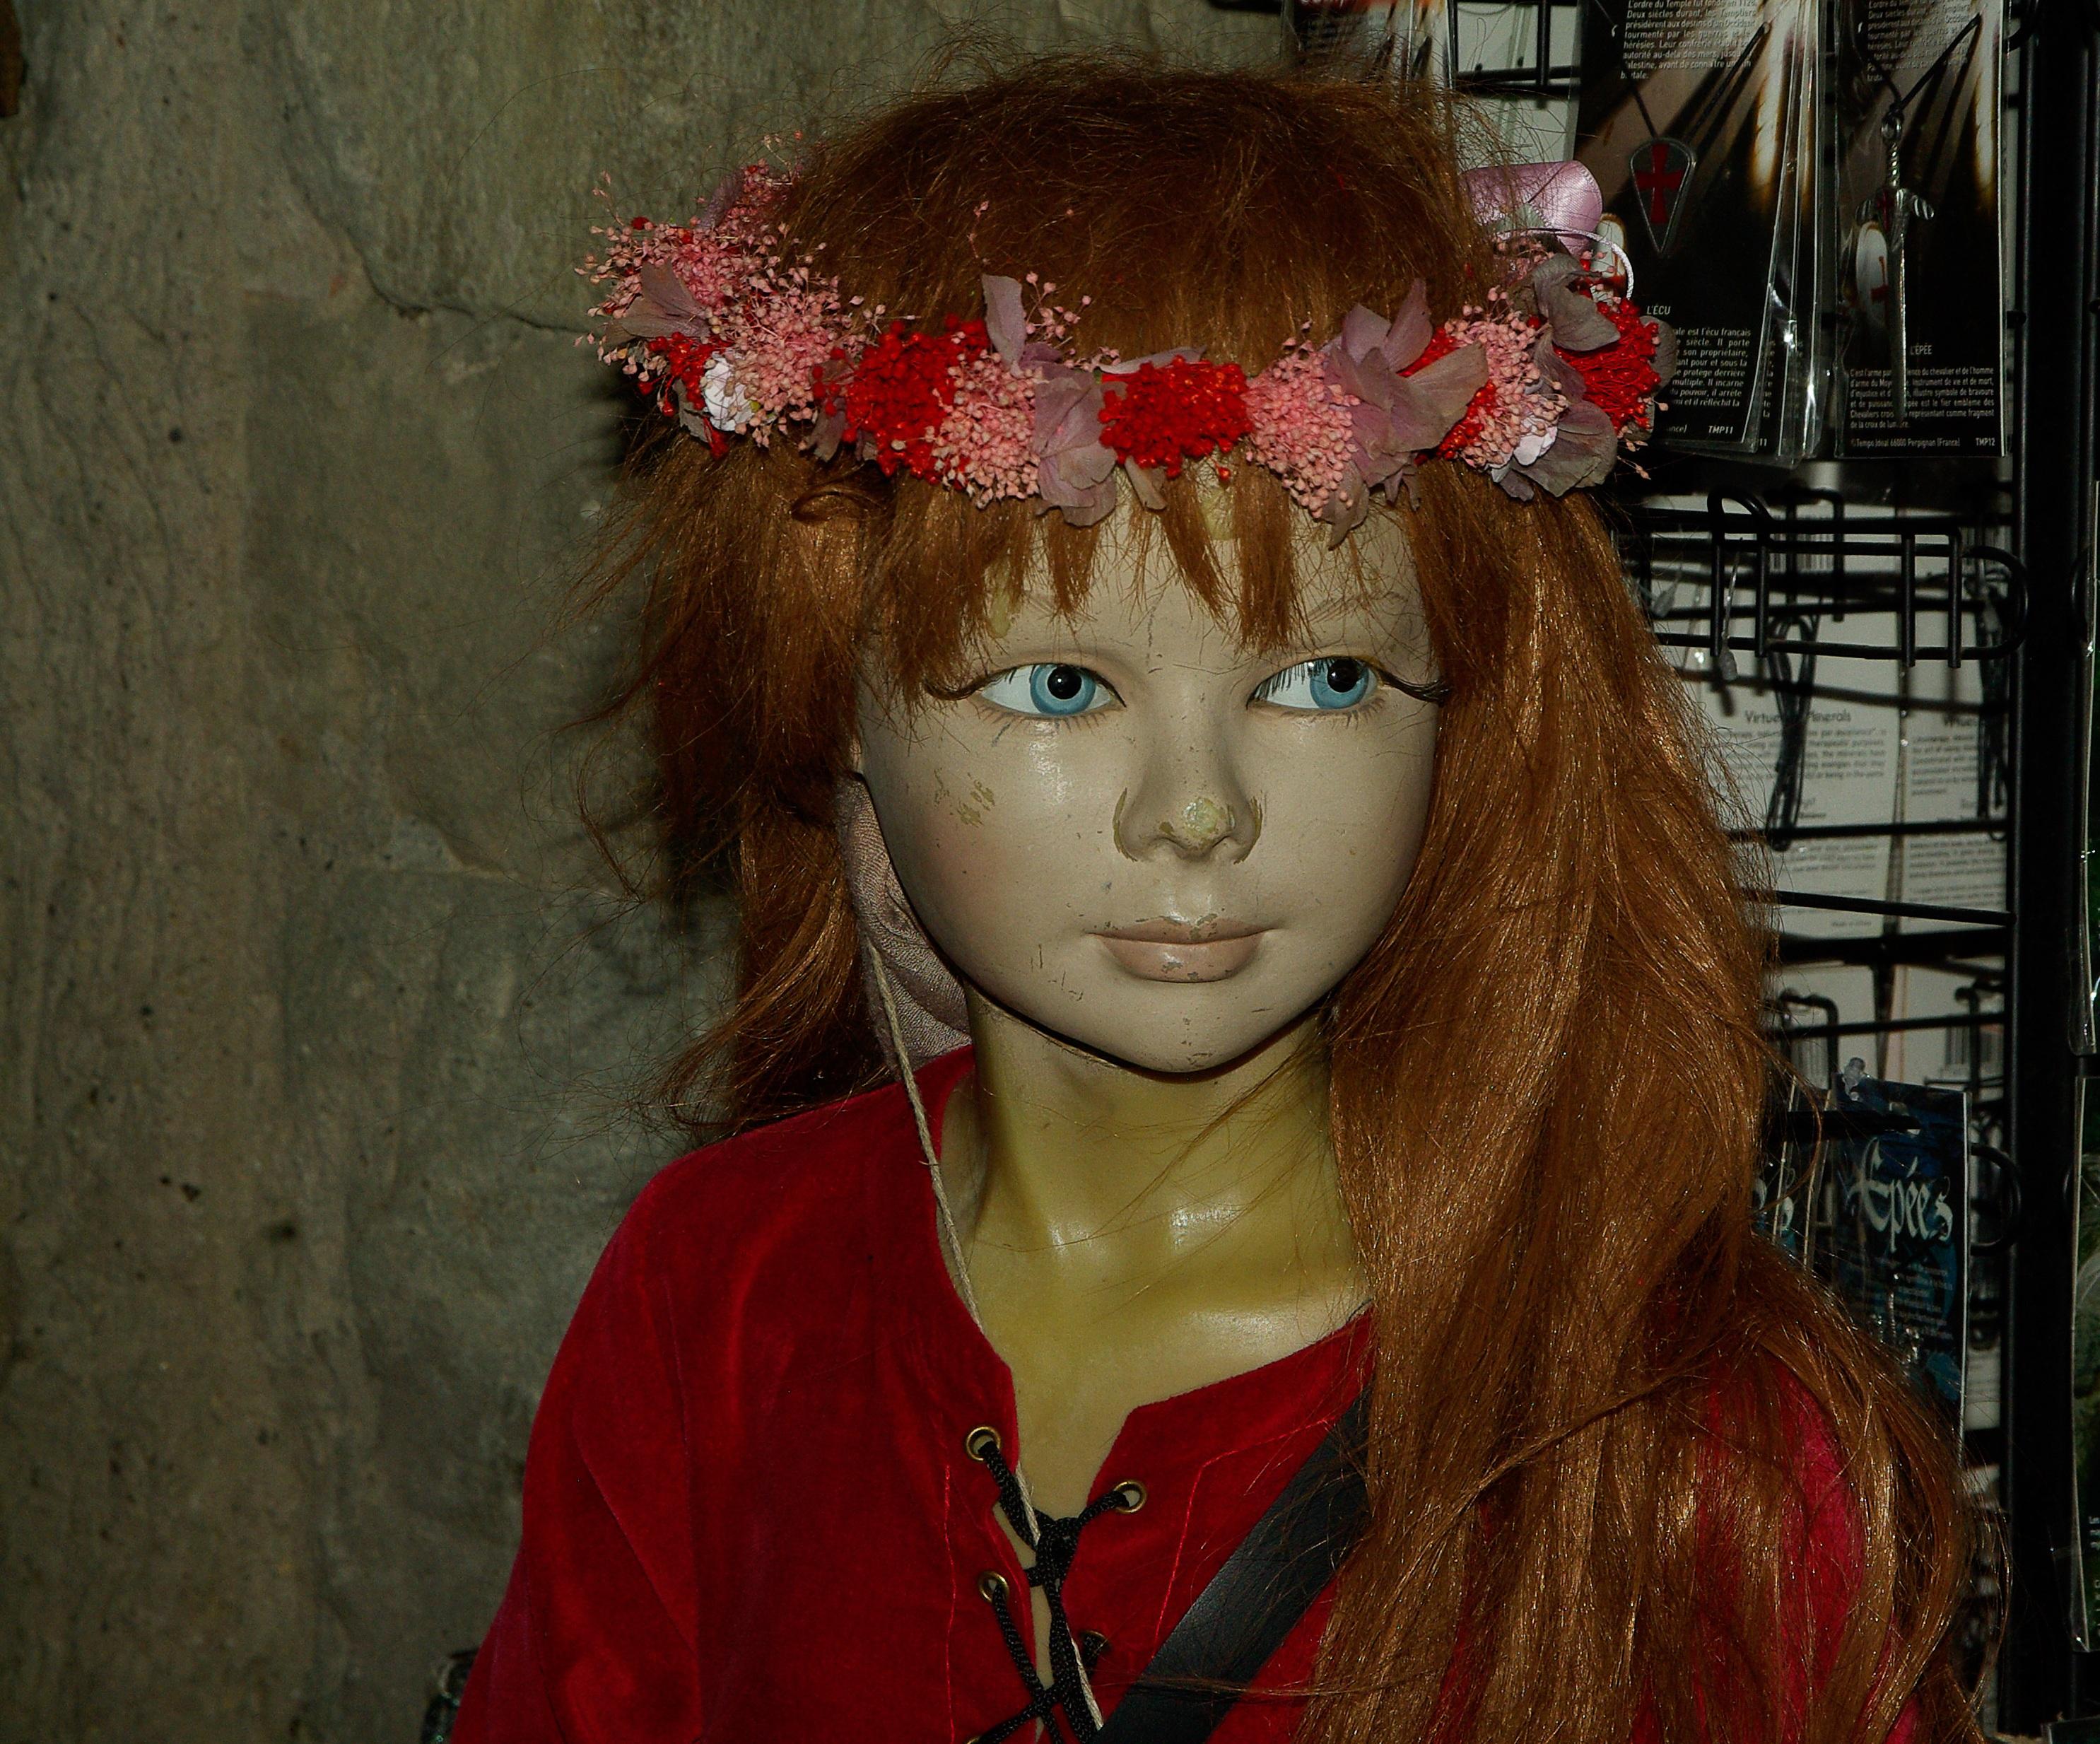 Fotos gratis : niña, rojo, color, ropa, dama, corona, maniquí, muñeca, vestir, ojo, cabeza ...